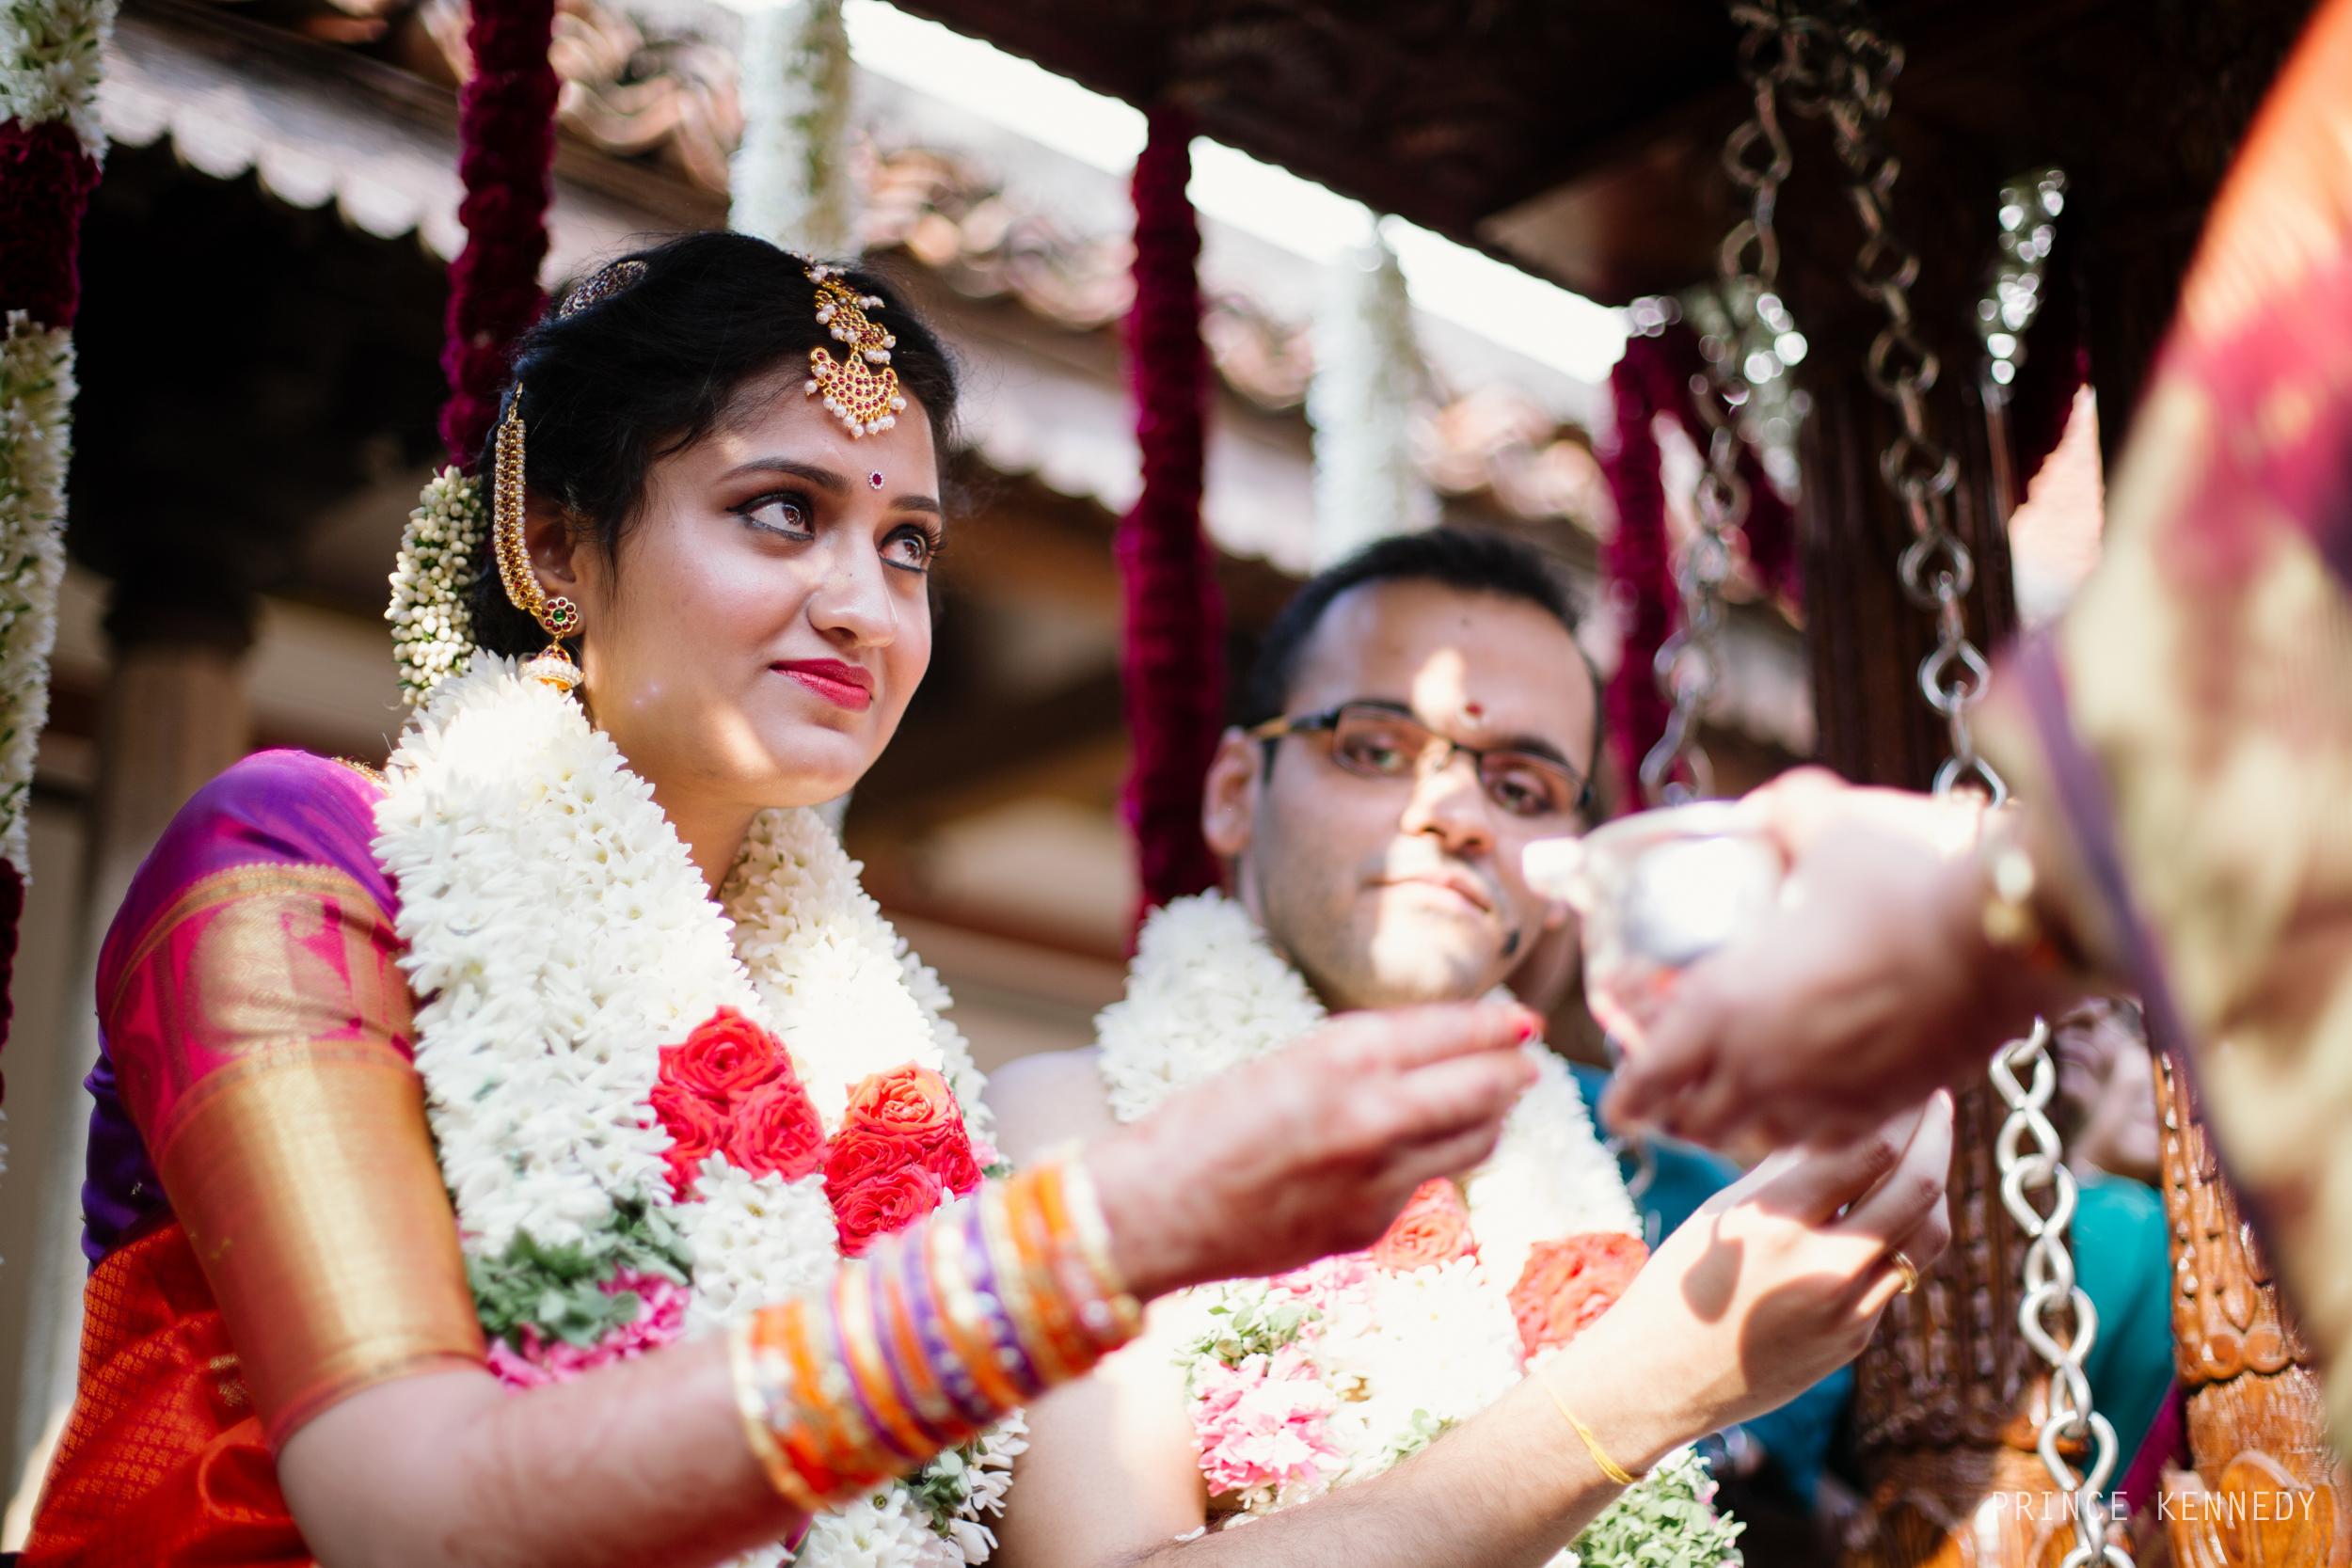 Athmajja-Nithesh-Engagement-Couple-Portrait-Portraiture-Wedding-Couple-Portrait-Chennai-Photographer-Candid-Photography-Destination-Best-Prince-Kennedy-Photography-130.jpg